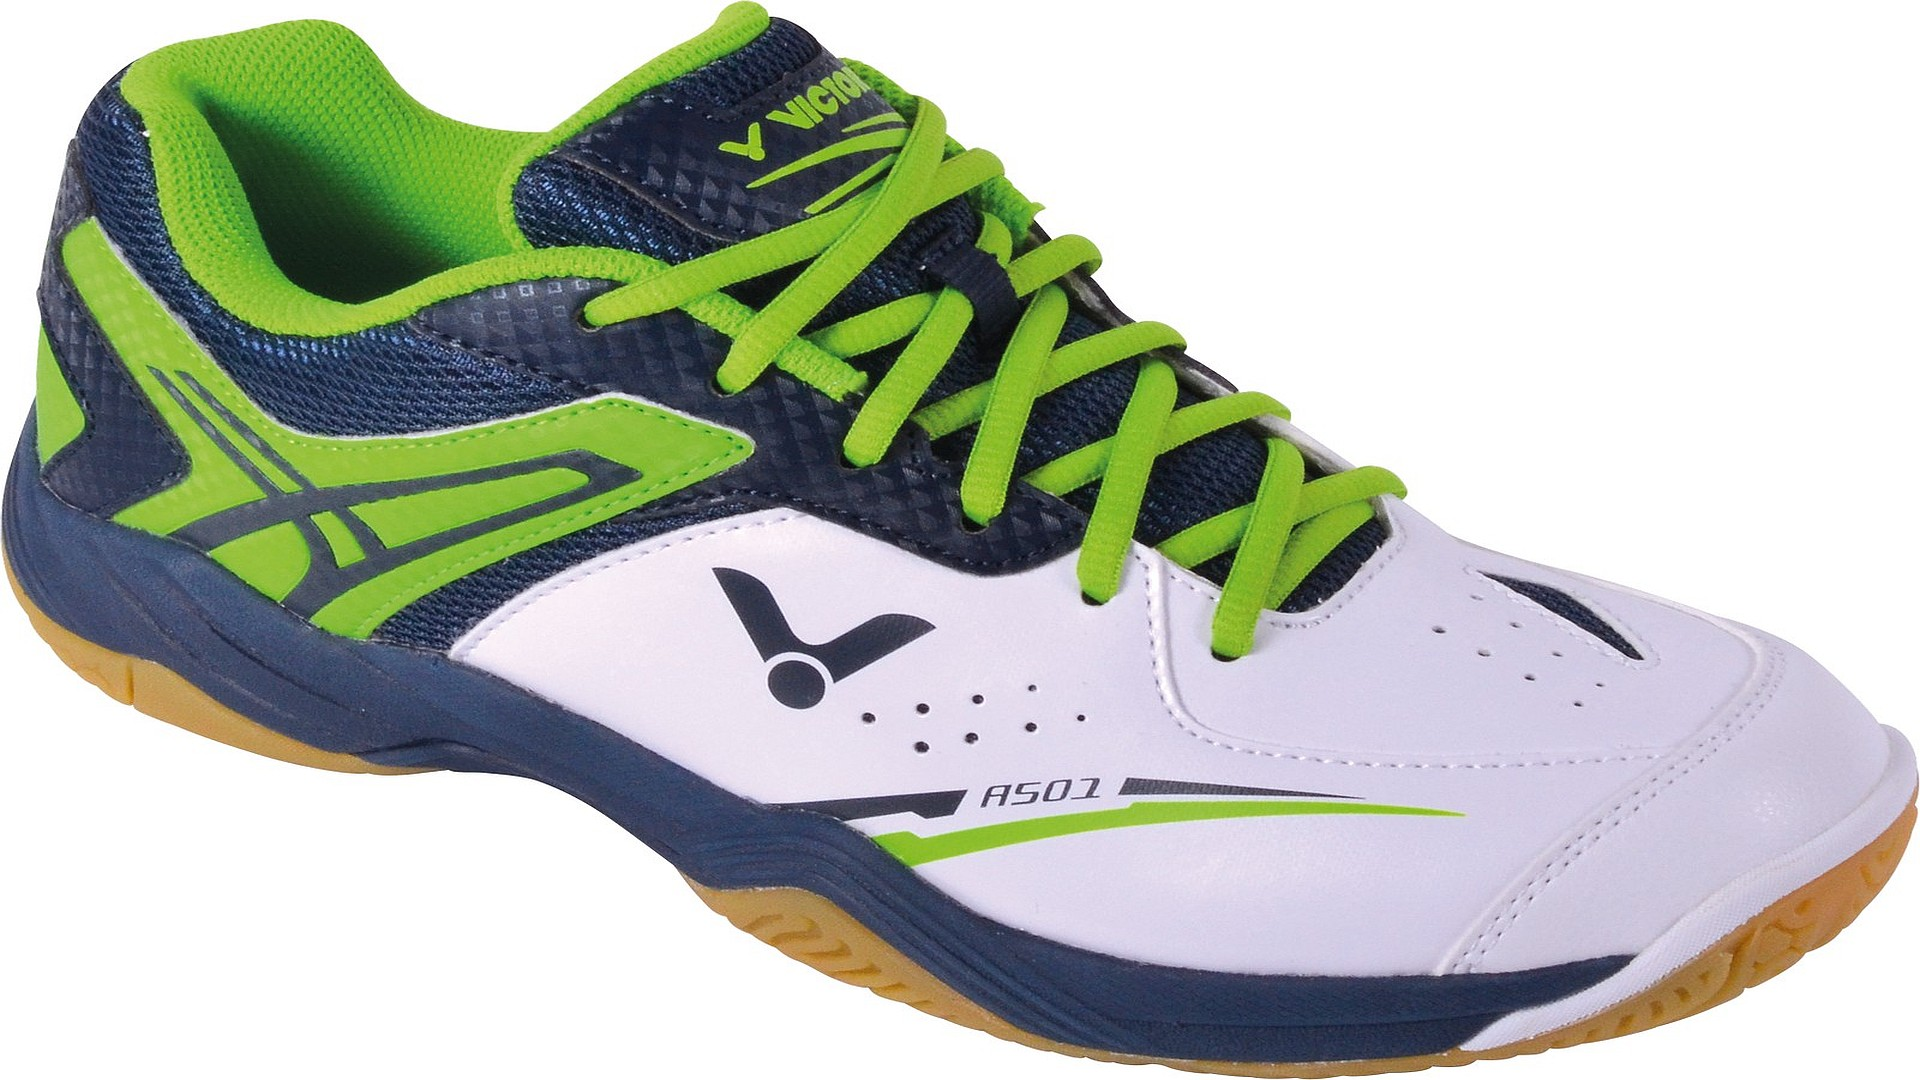 Victor A501 grün